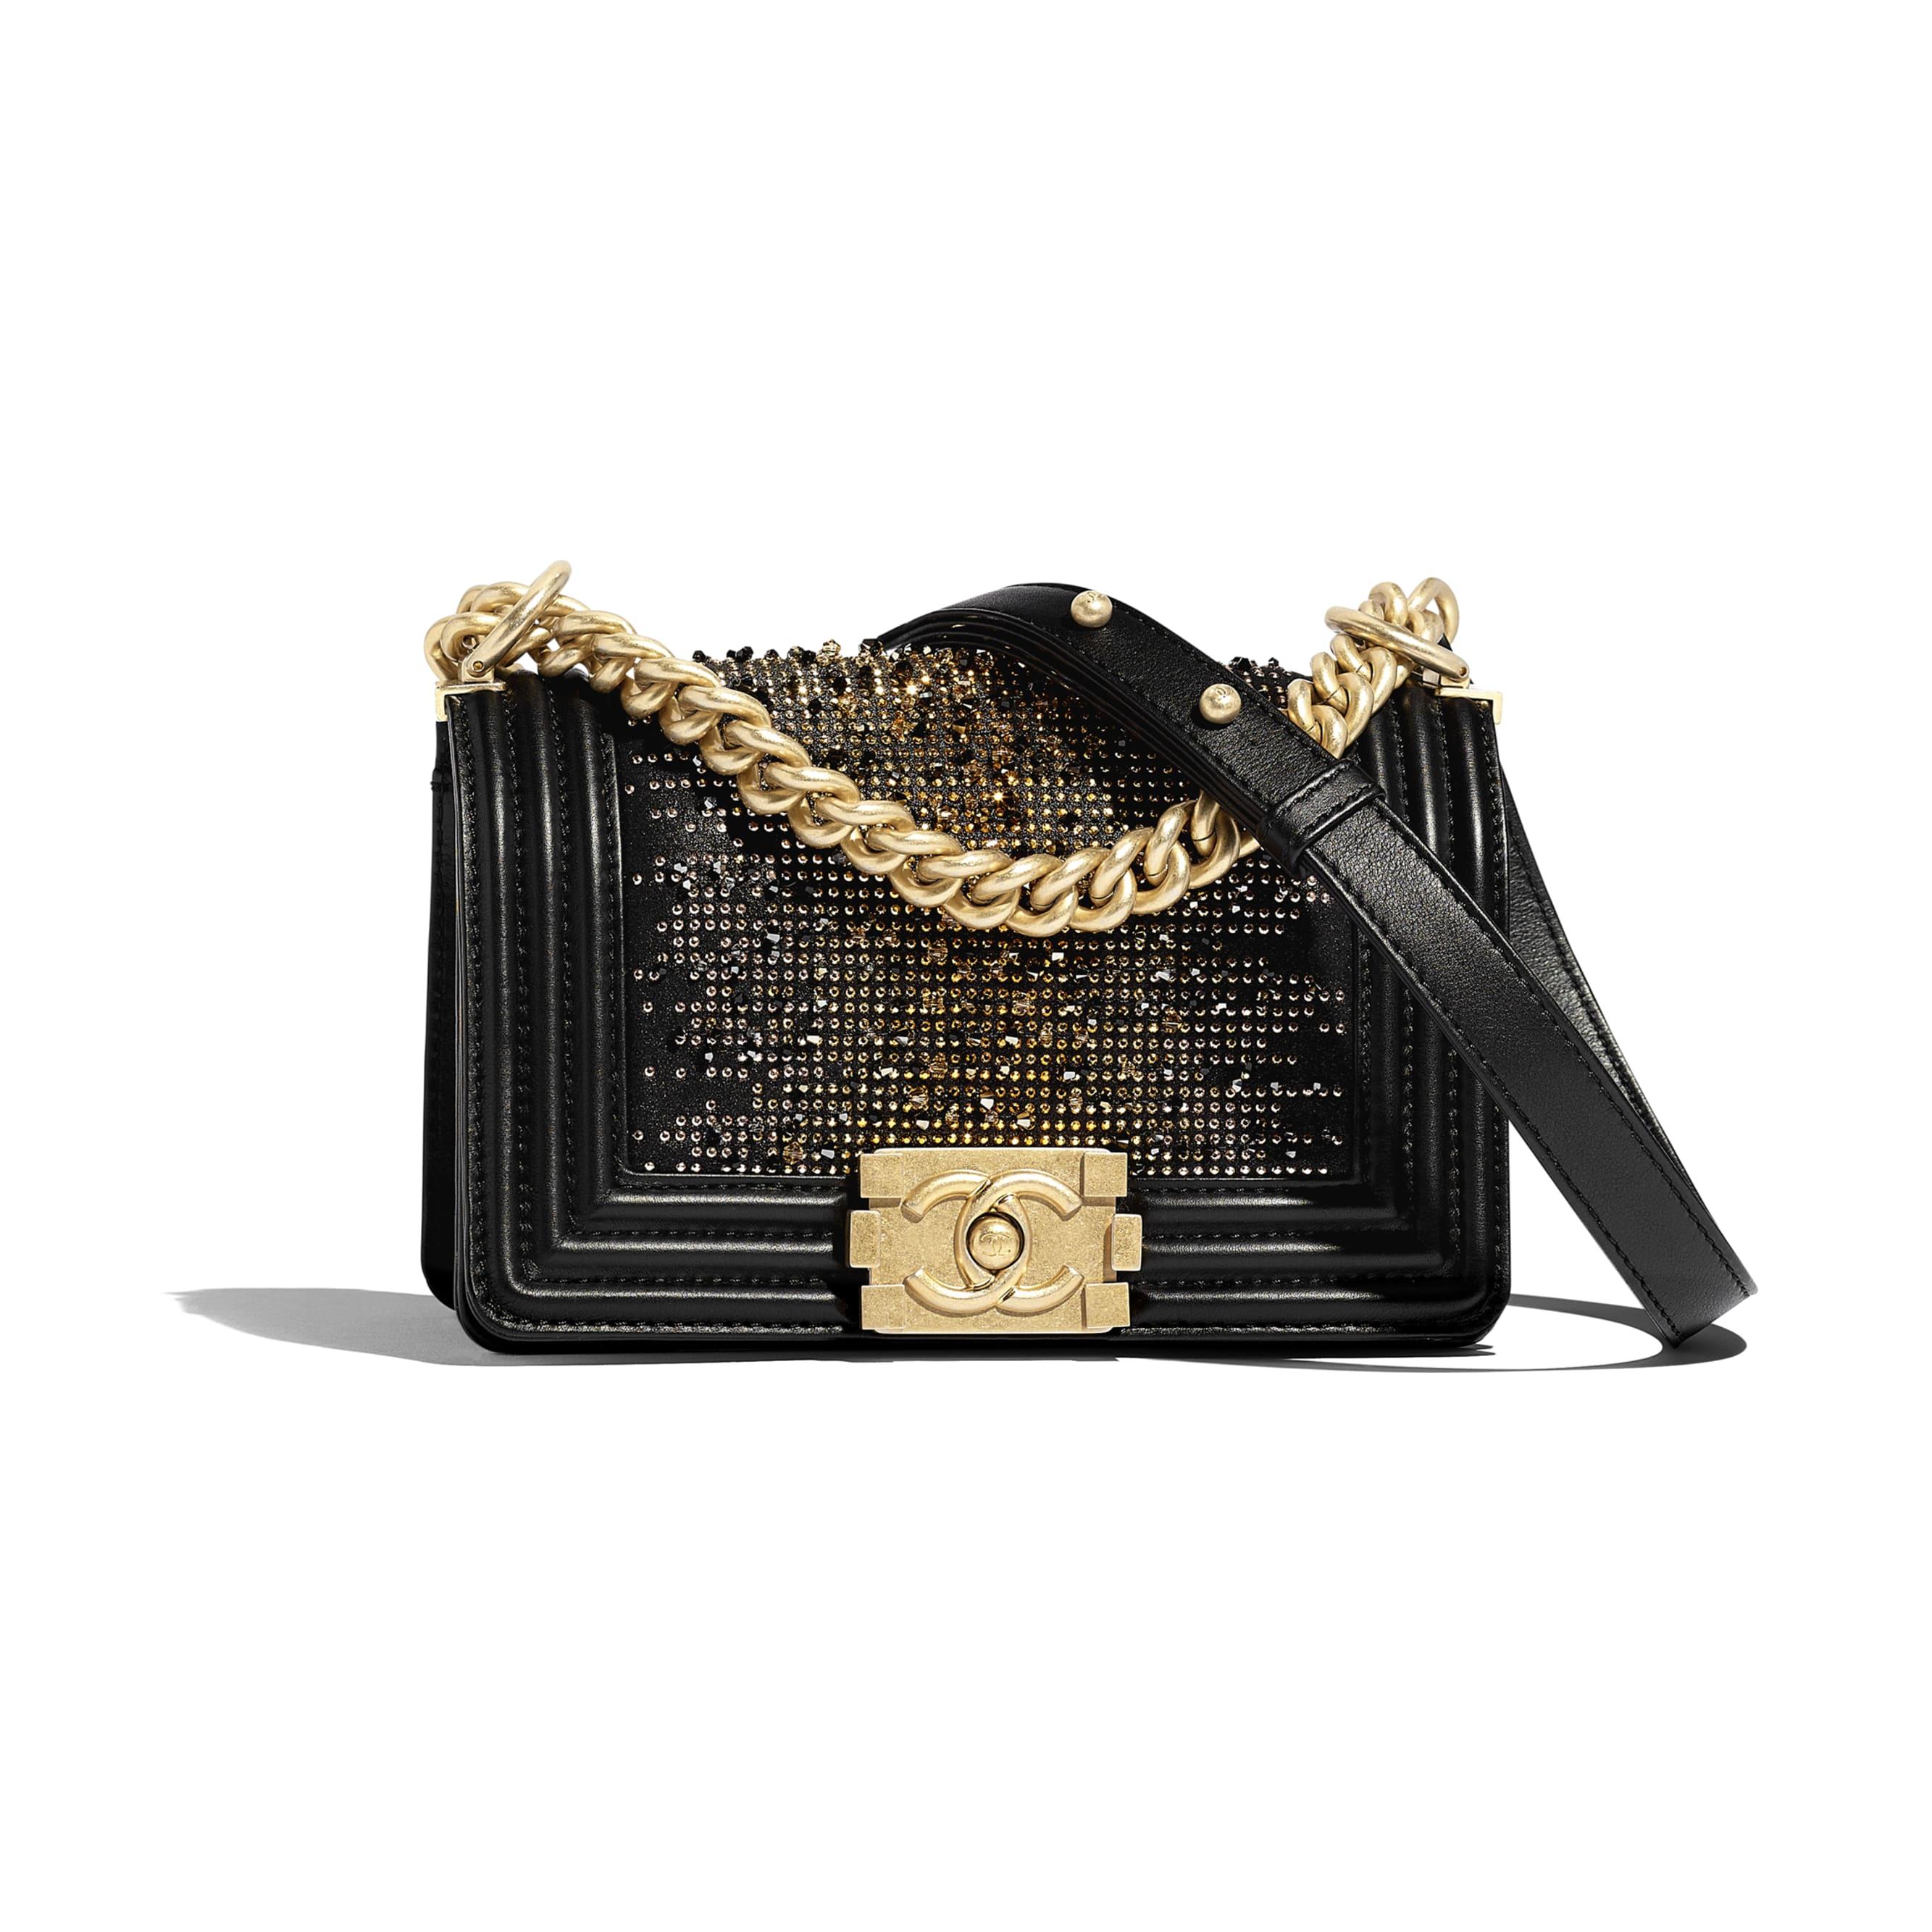 Small BOY CHANEL Handbag - Black - Calfskin, Strass & Gold-Tone Metal - Default view - see standard sized version